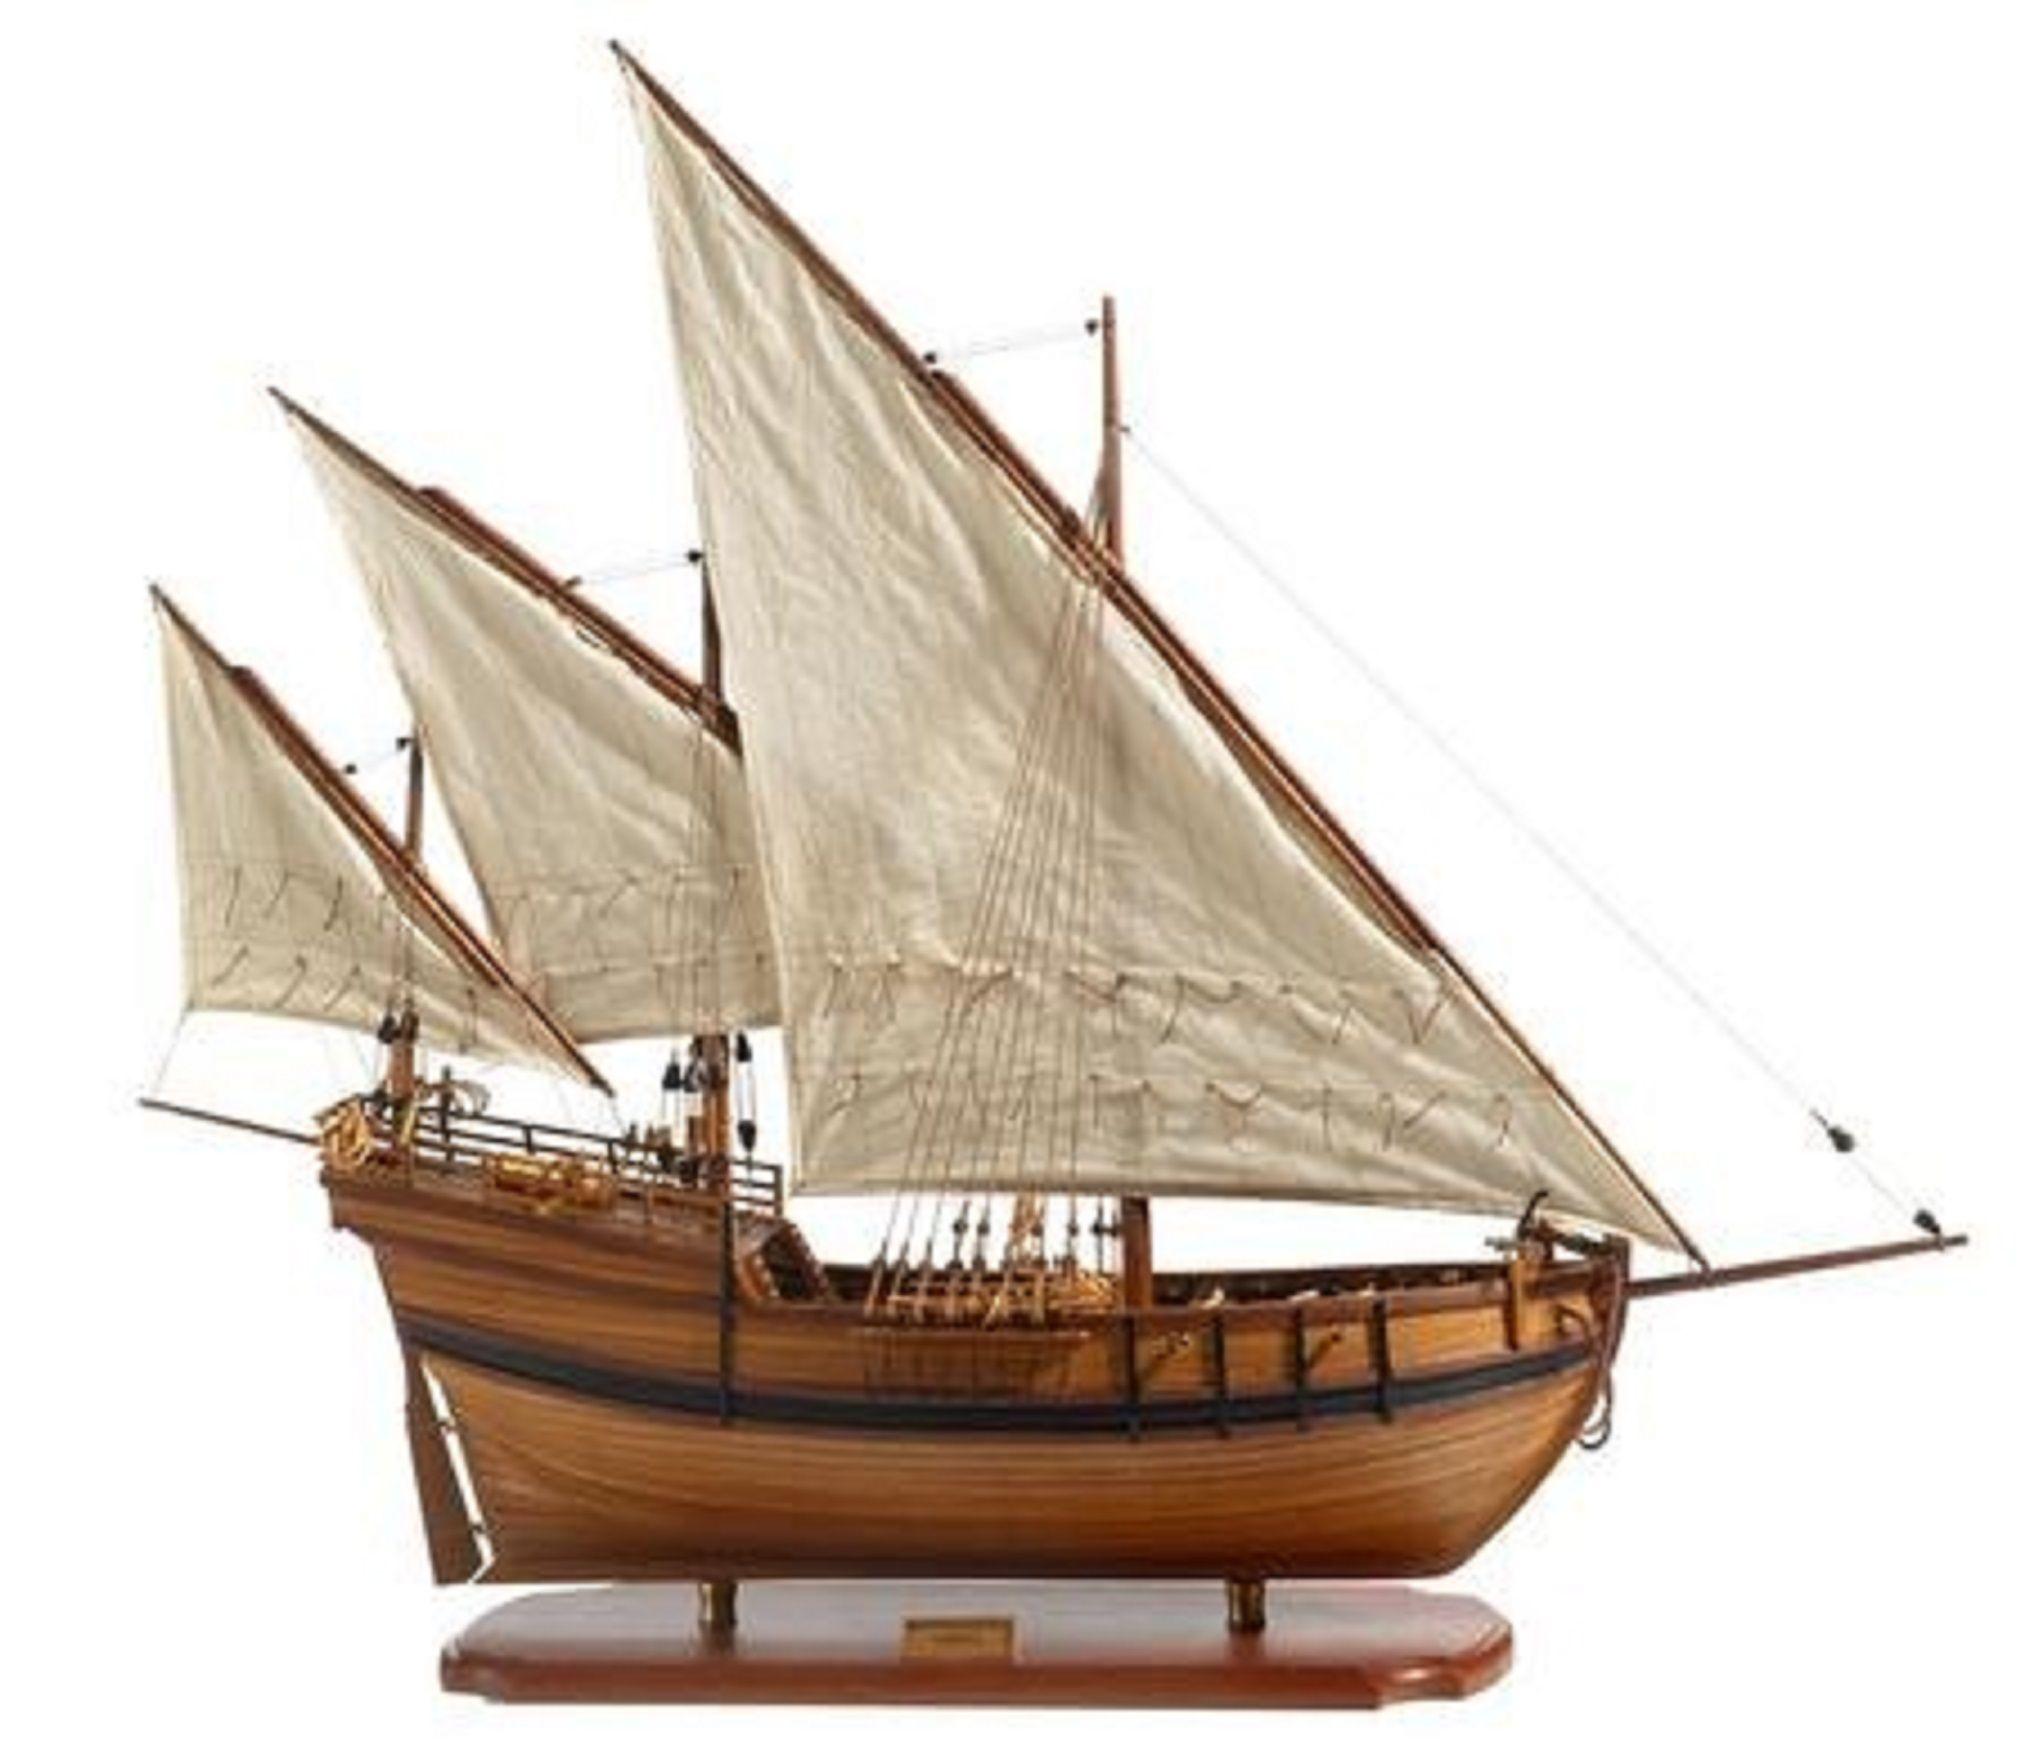 Caravel Model Ship Premier Range Handcrafted Wooden Ready